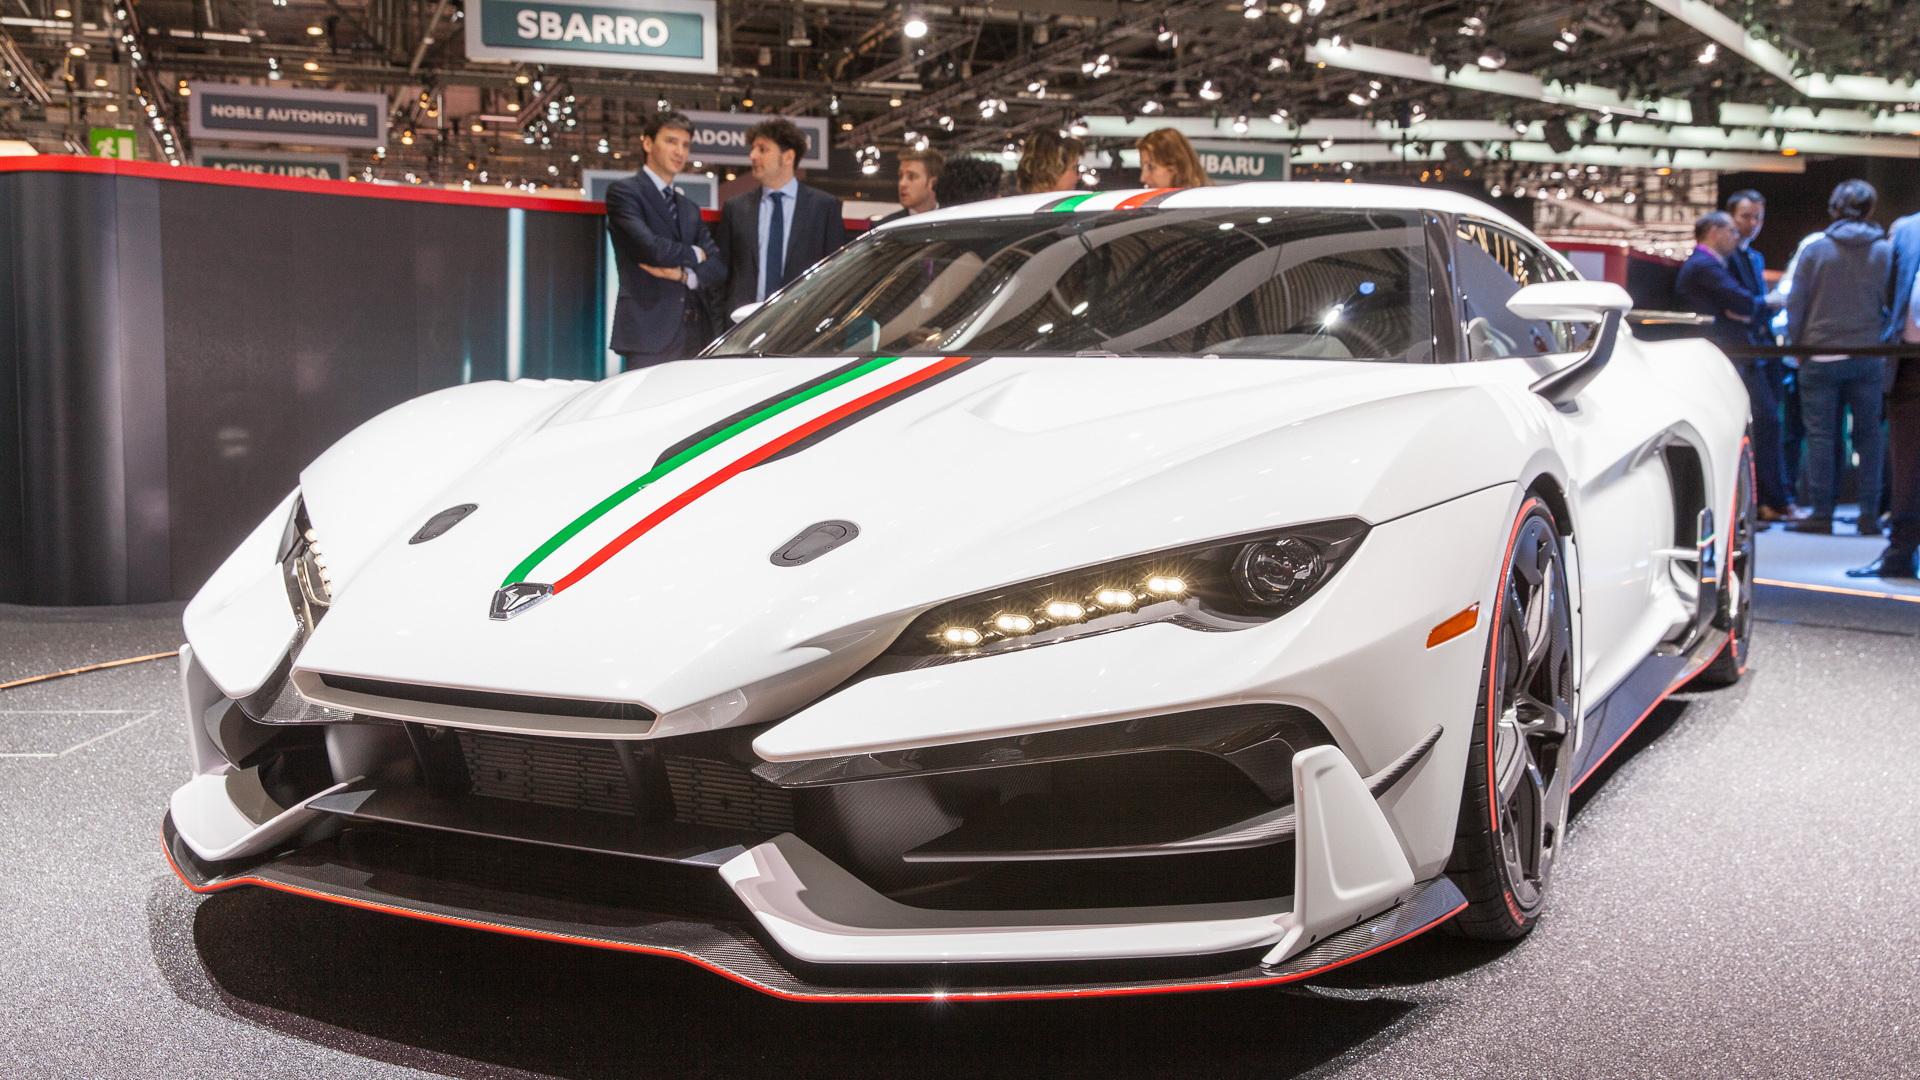 Italdesign Zerouno, 2017 Geneva auto show